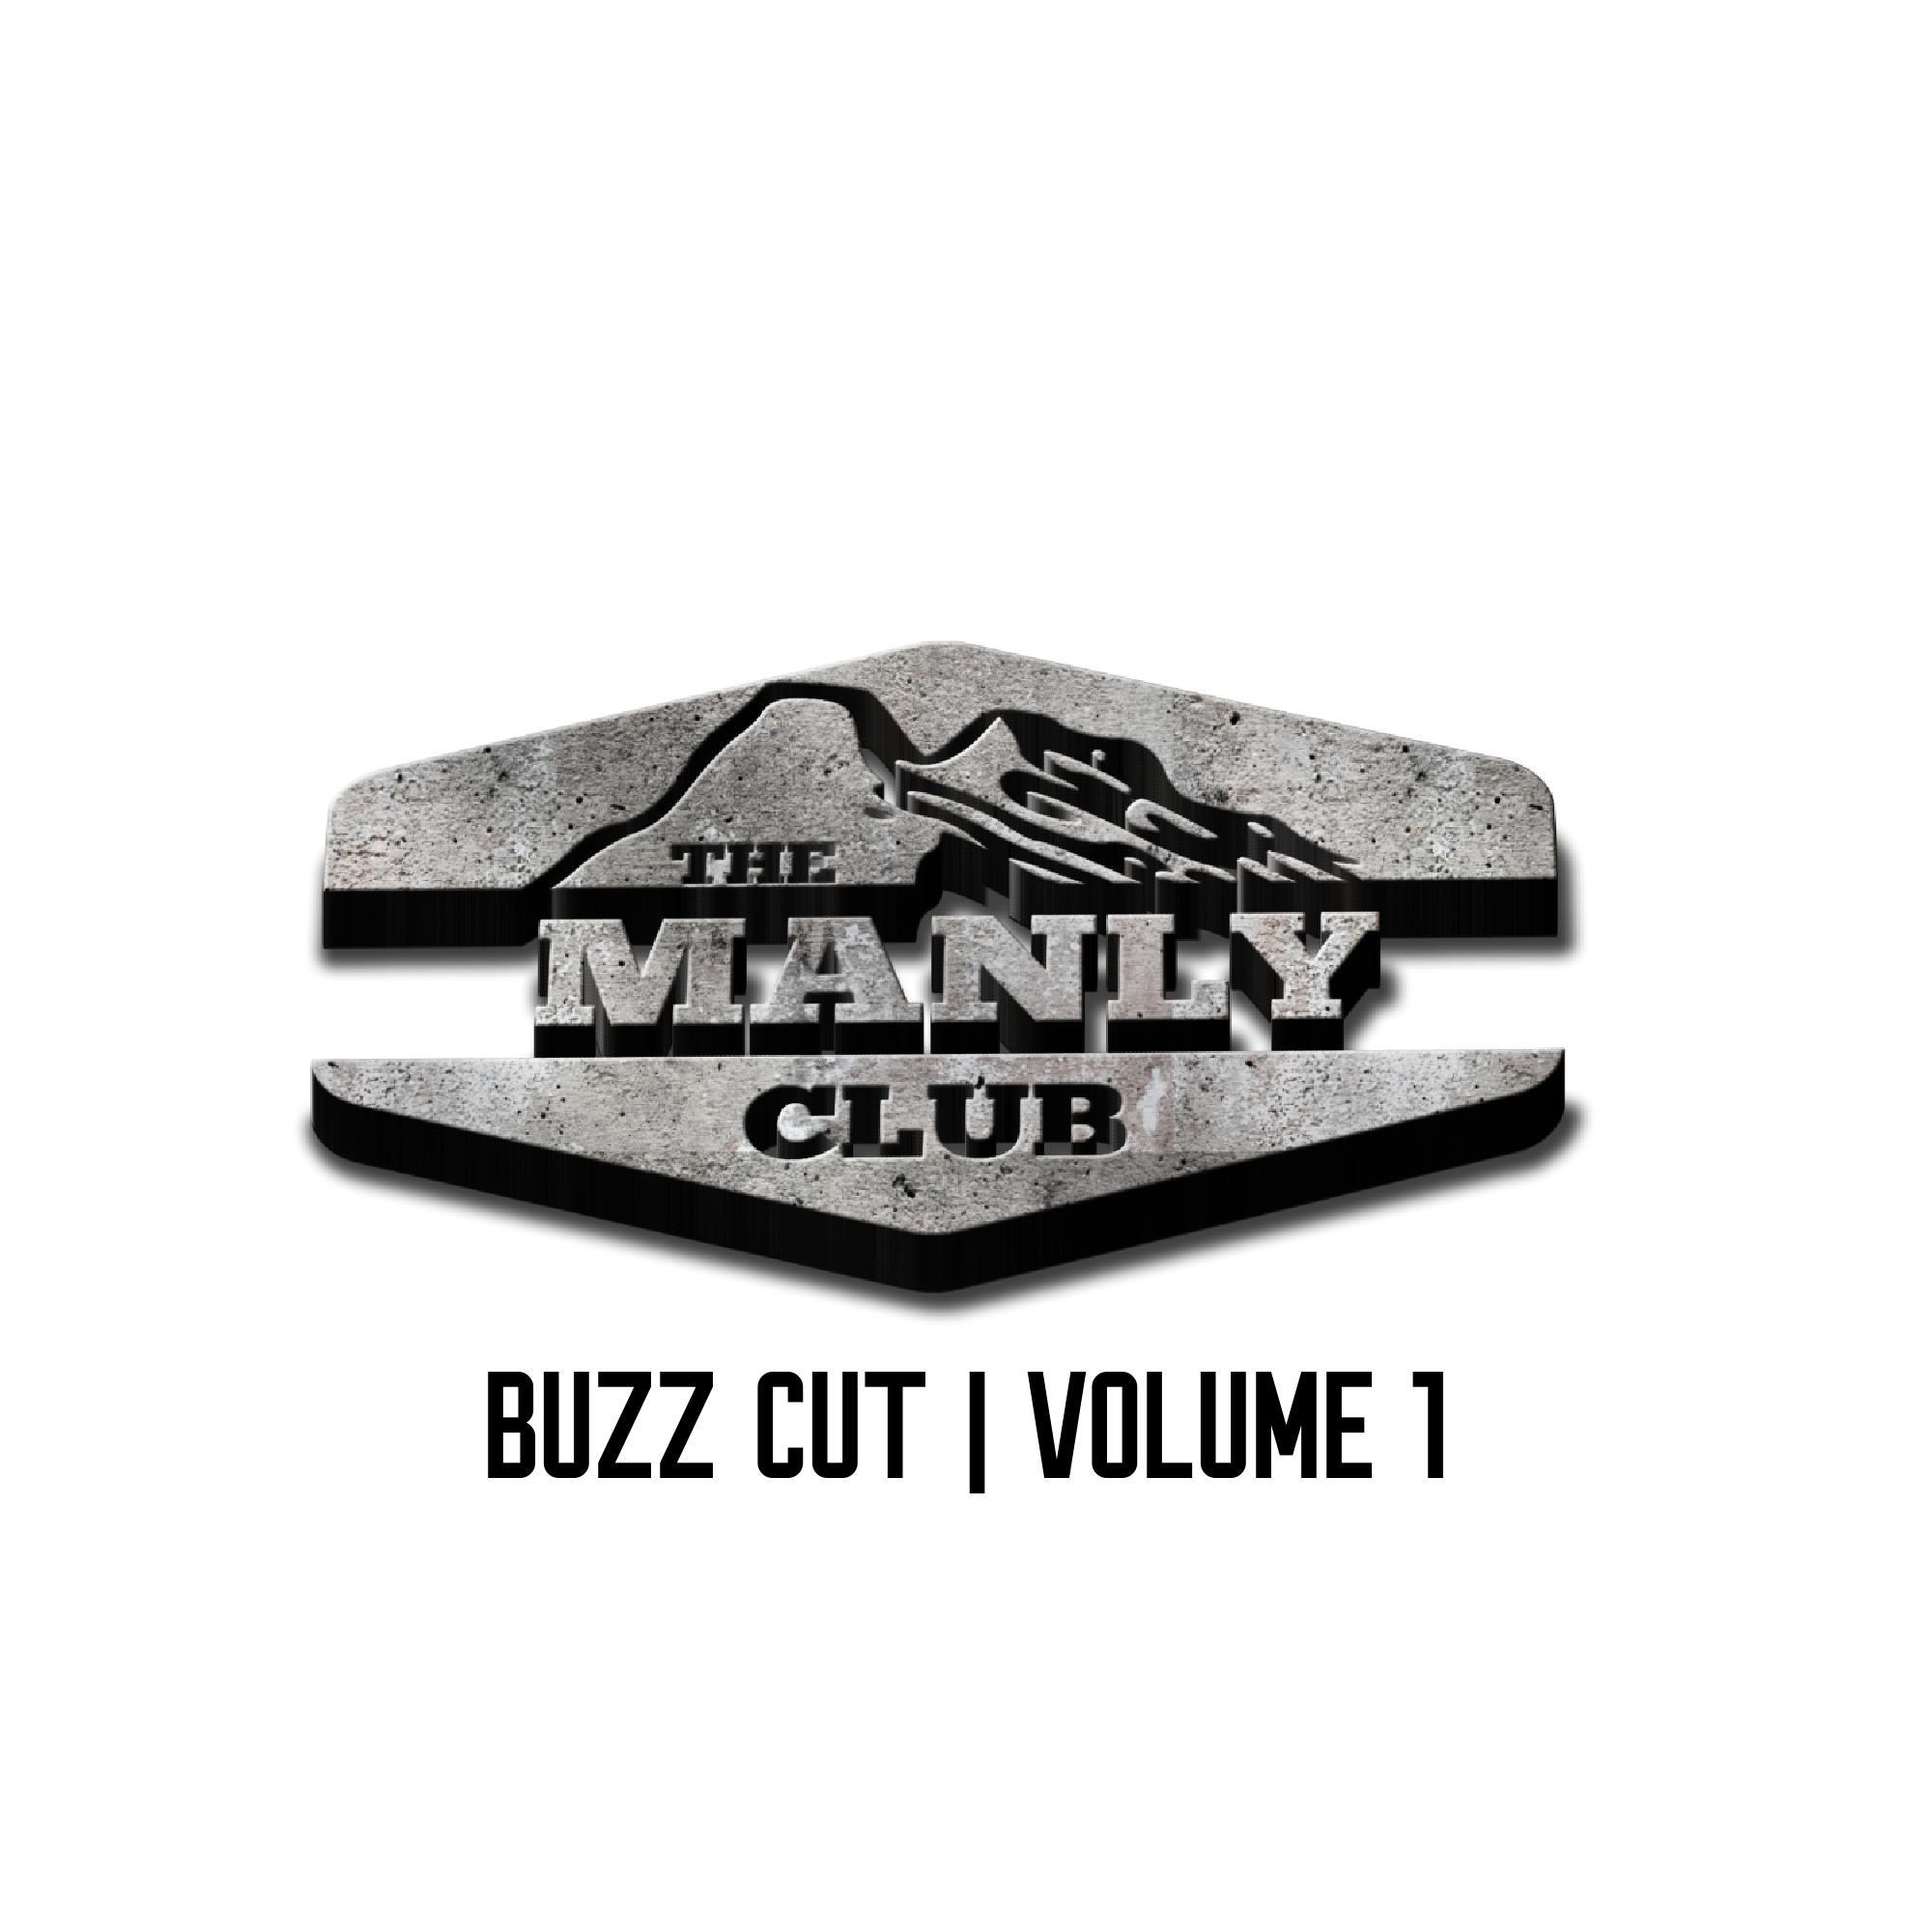 the manly club buzz cut volume 1